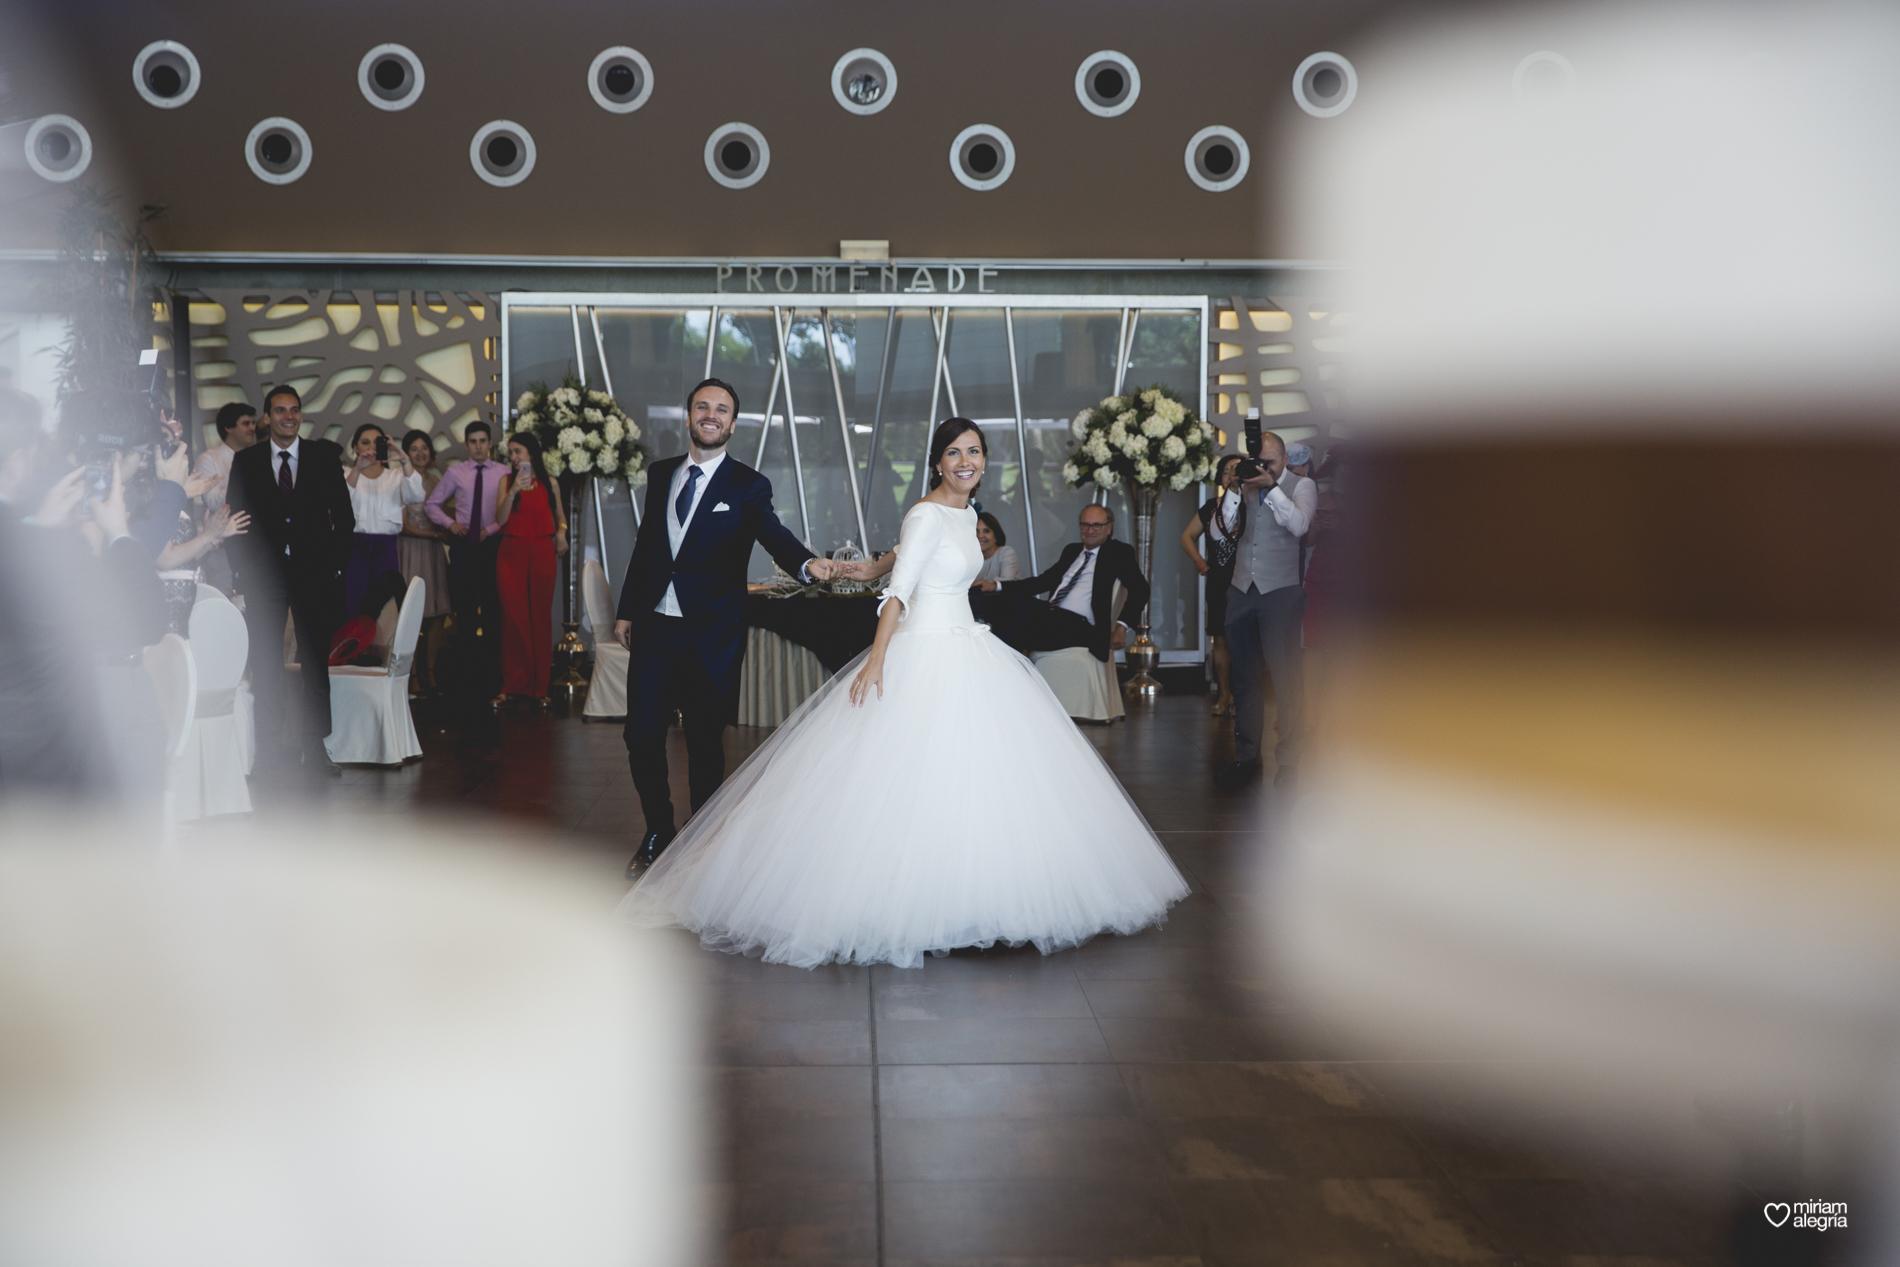 boda-en-la-catedral-de-murcia-miriam-alegria-fotografos-boda-murcia-68